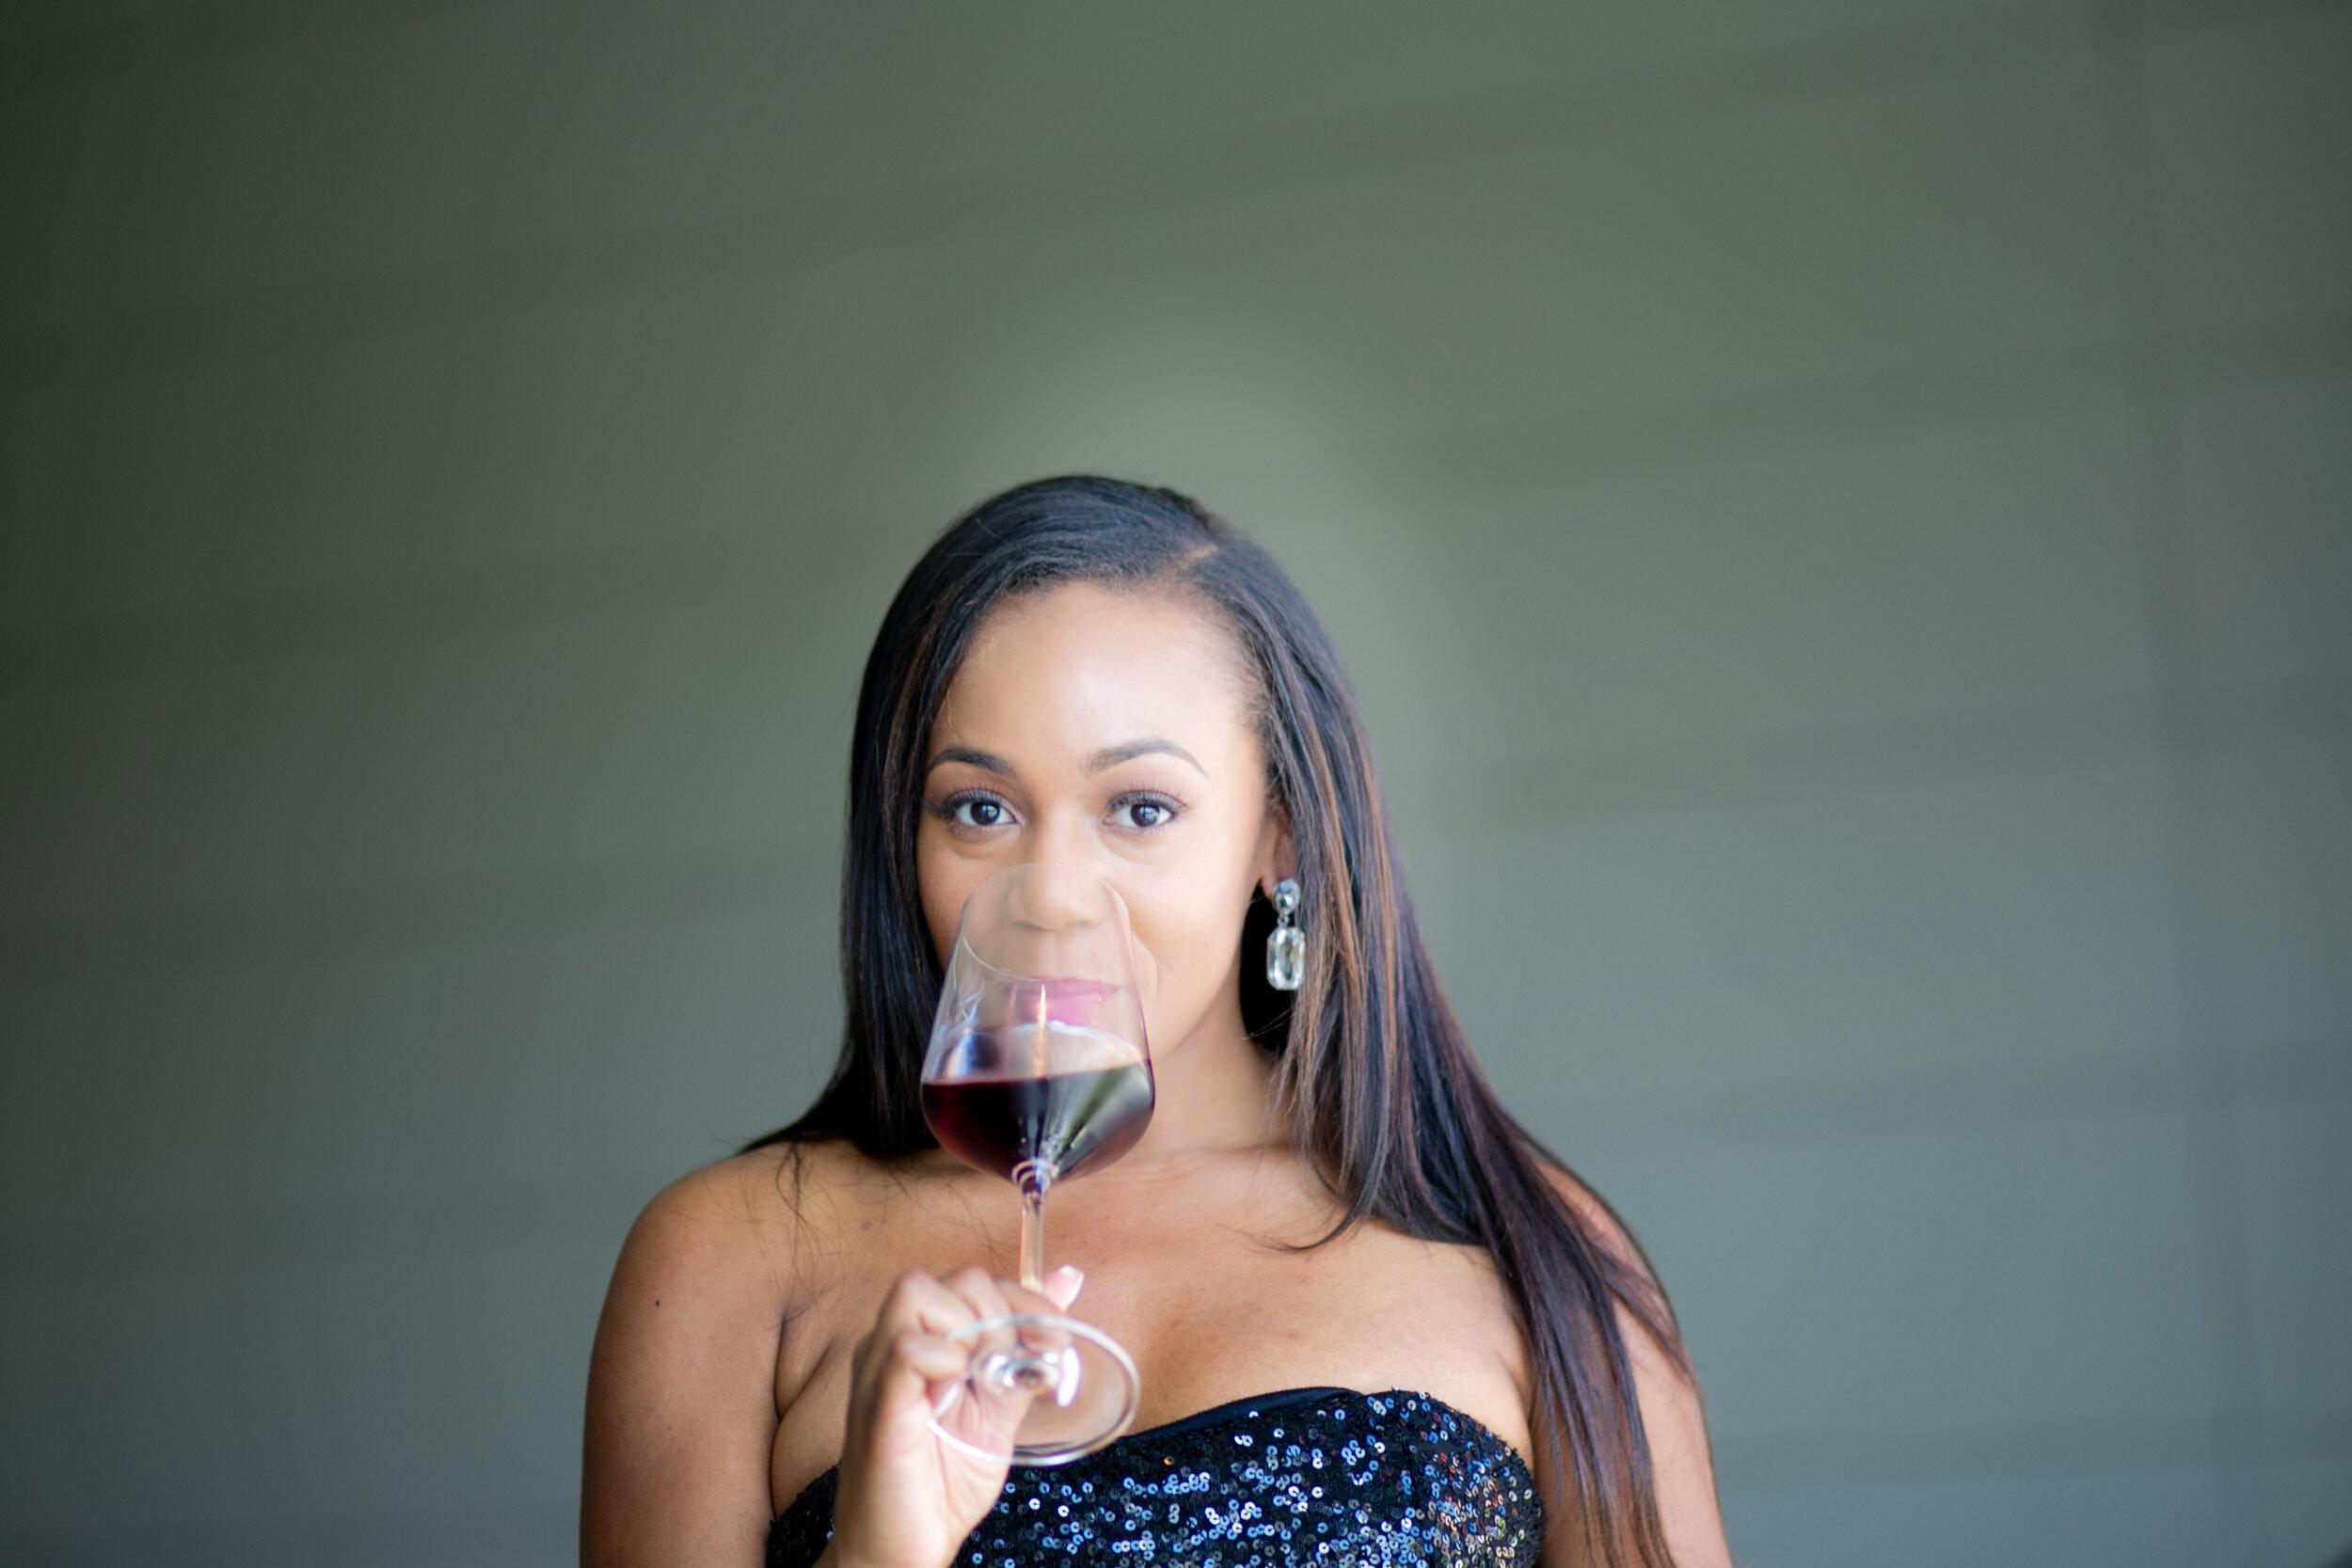 WSET 2 Wine Educator, The Wine Rac - Facebook @RacquelWinesInstagram @RacquelWines